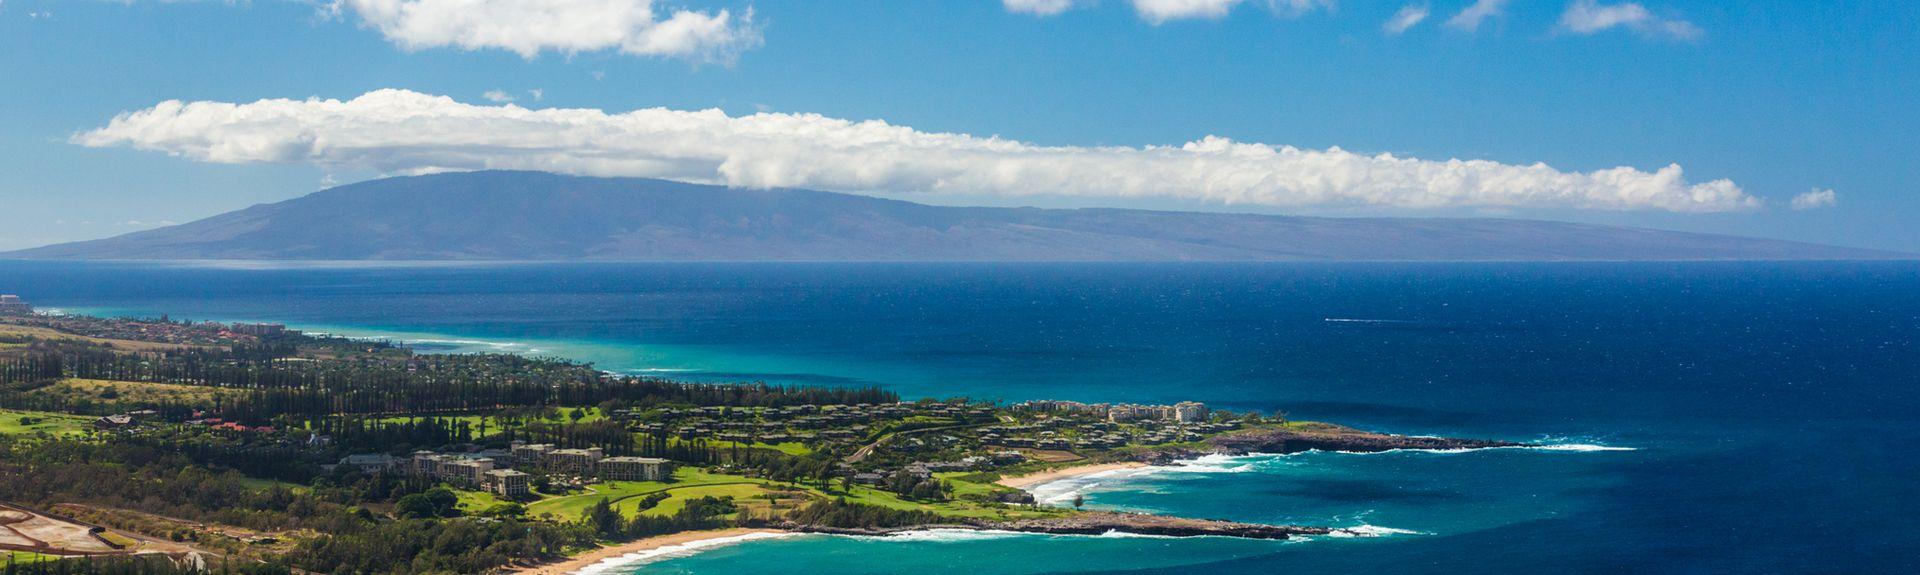 Napili Point Resort (Lahaina, Hawaii, Stati Uniti d'America)